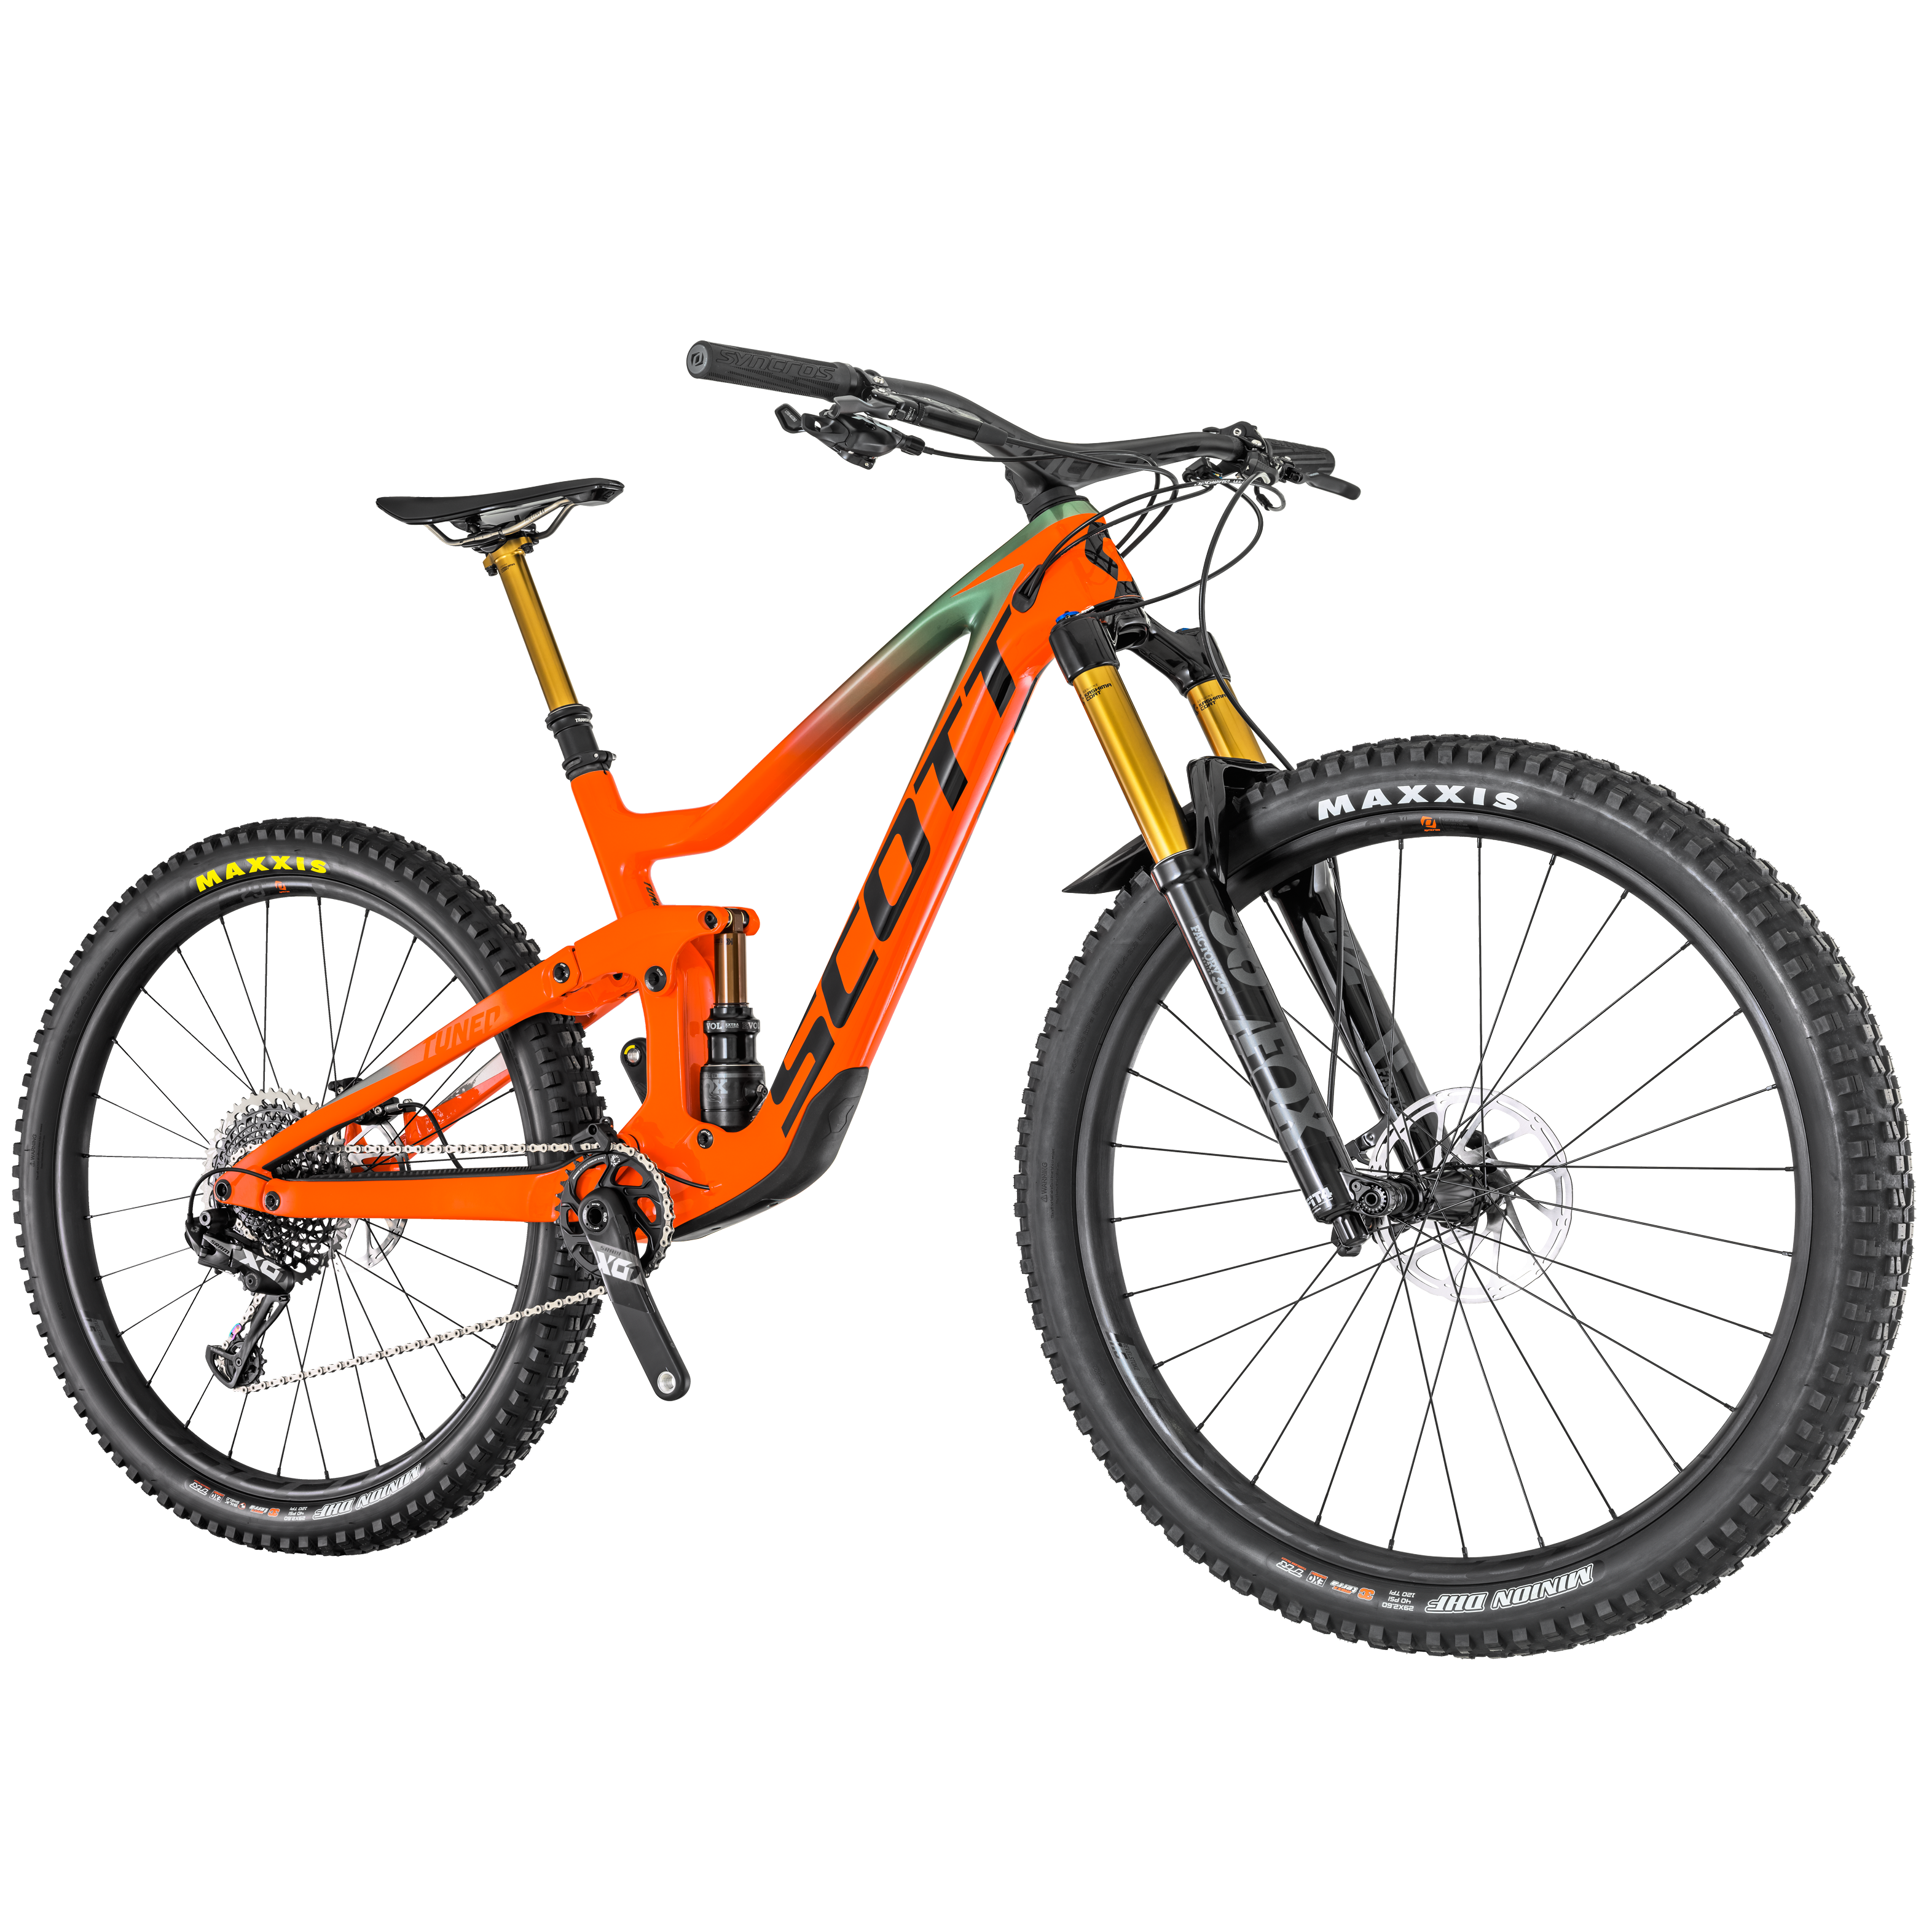 Scott Releases New Ransom Enduro Bike Bicycle Retailer